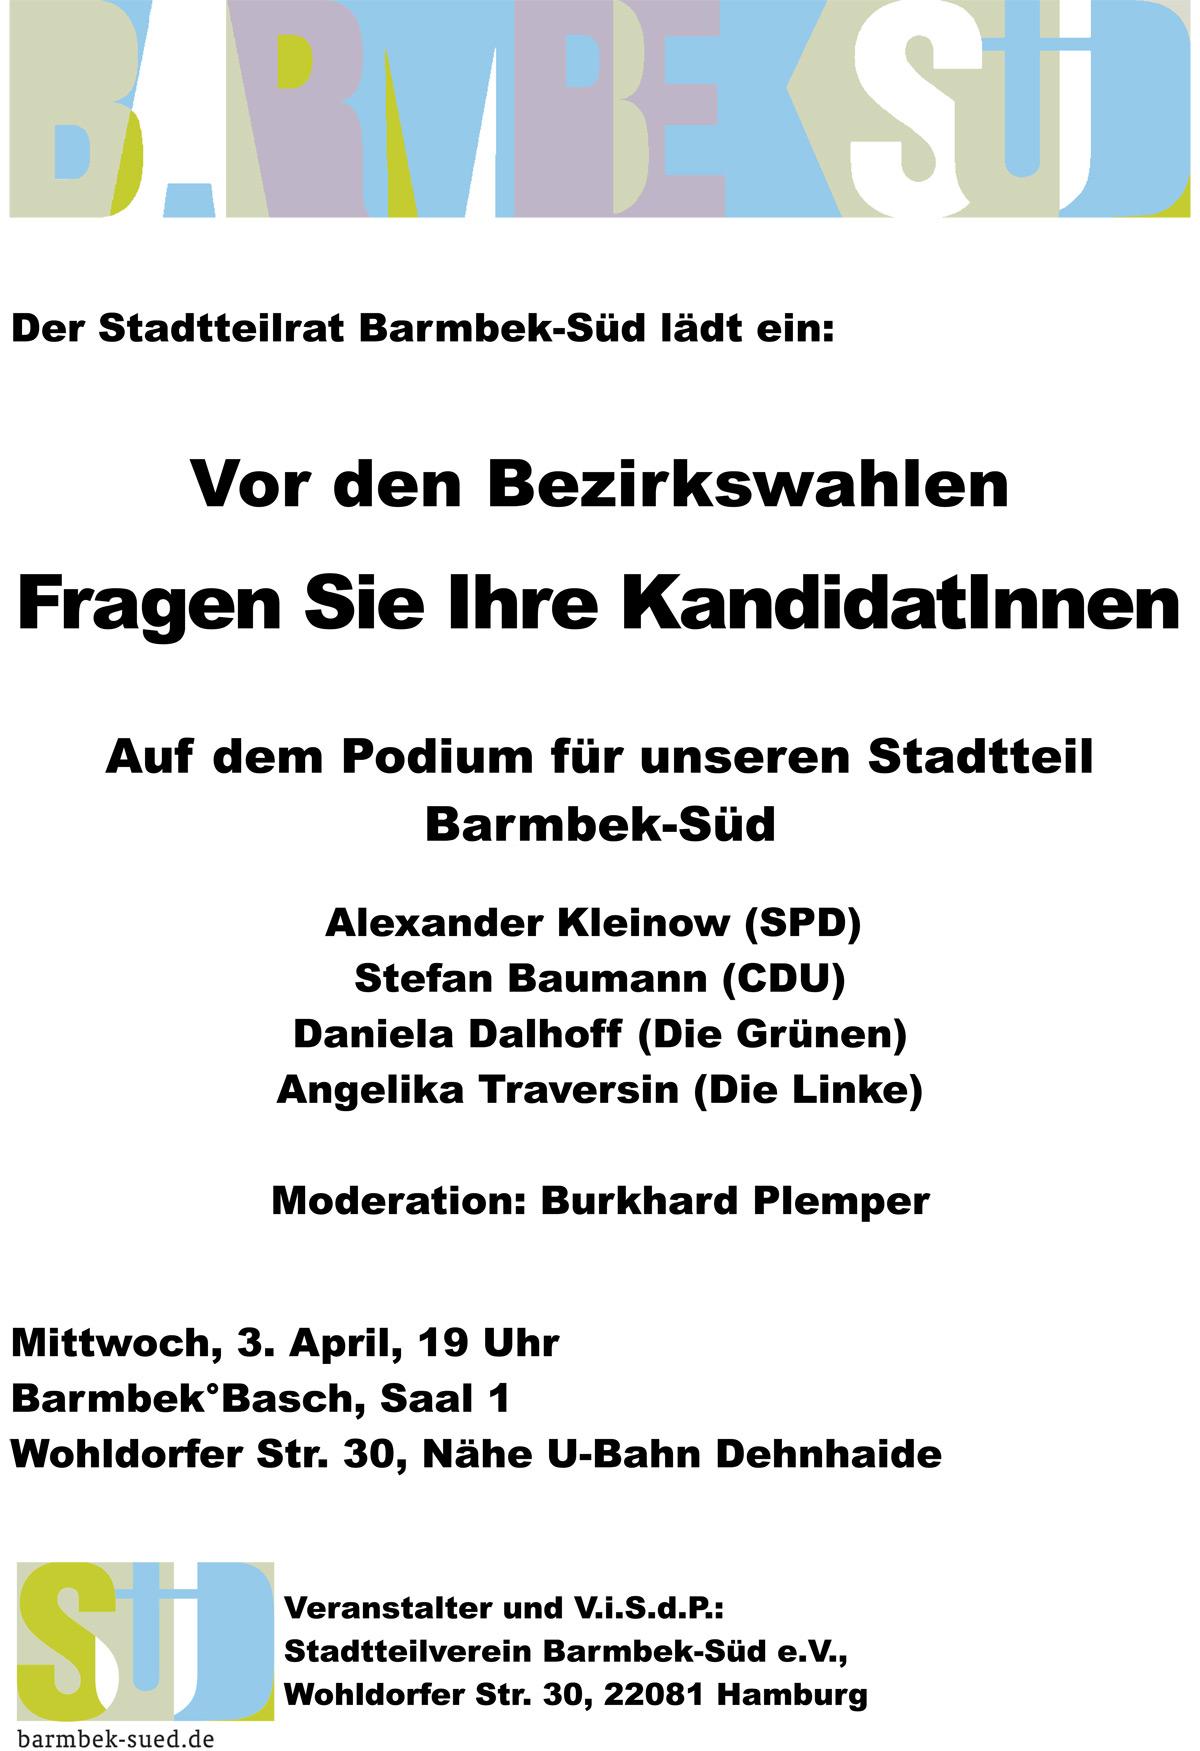 Wahlkreiskandidaten-STR-Barmbek-Süd-20190403